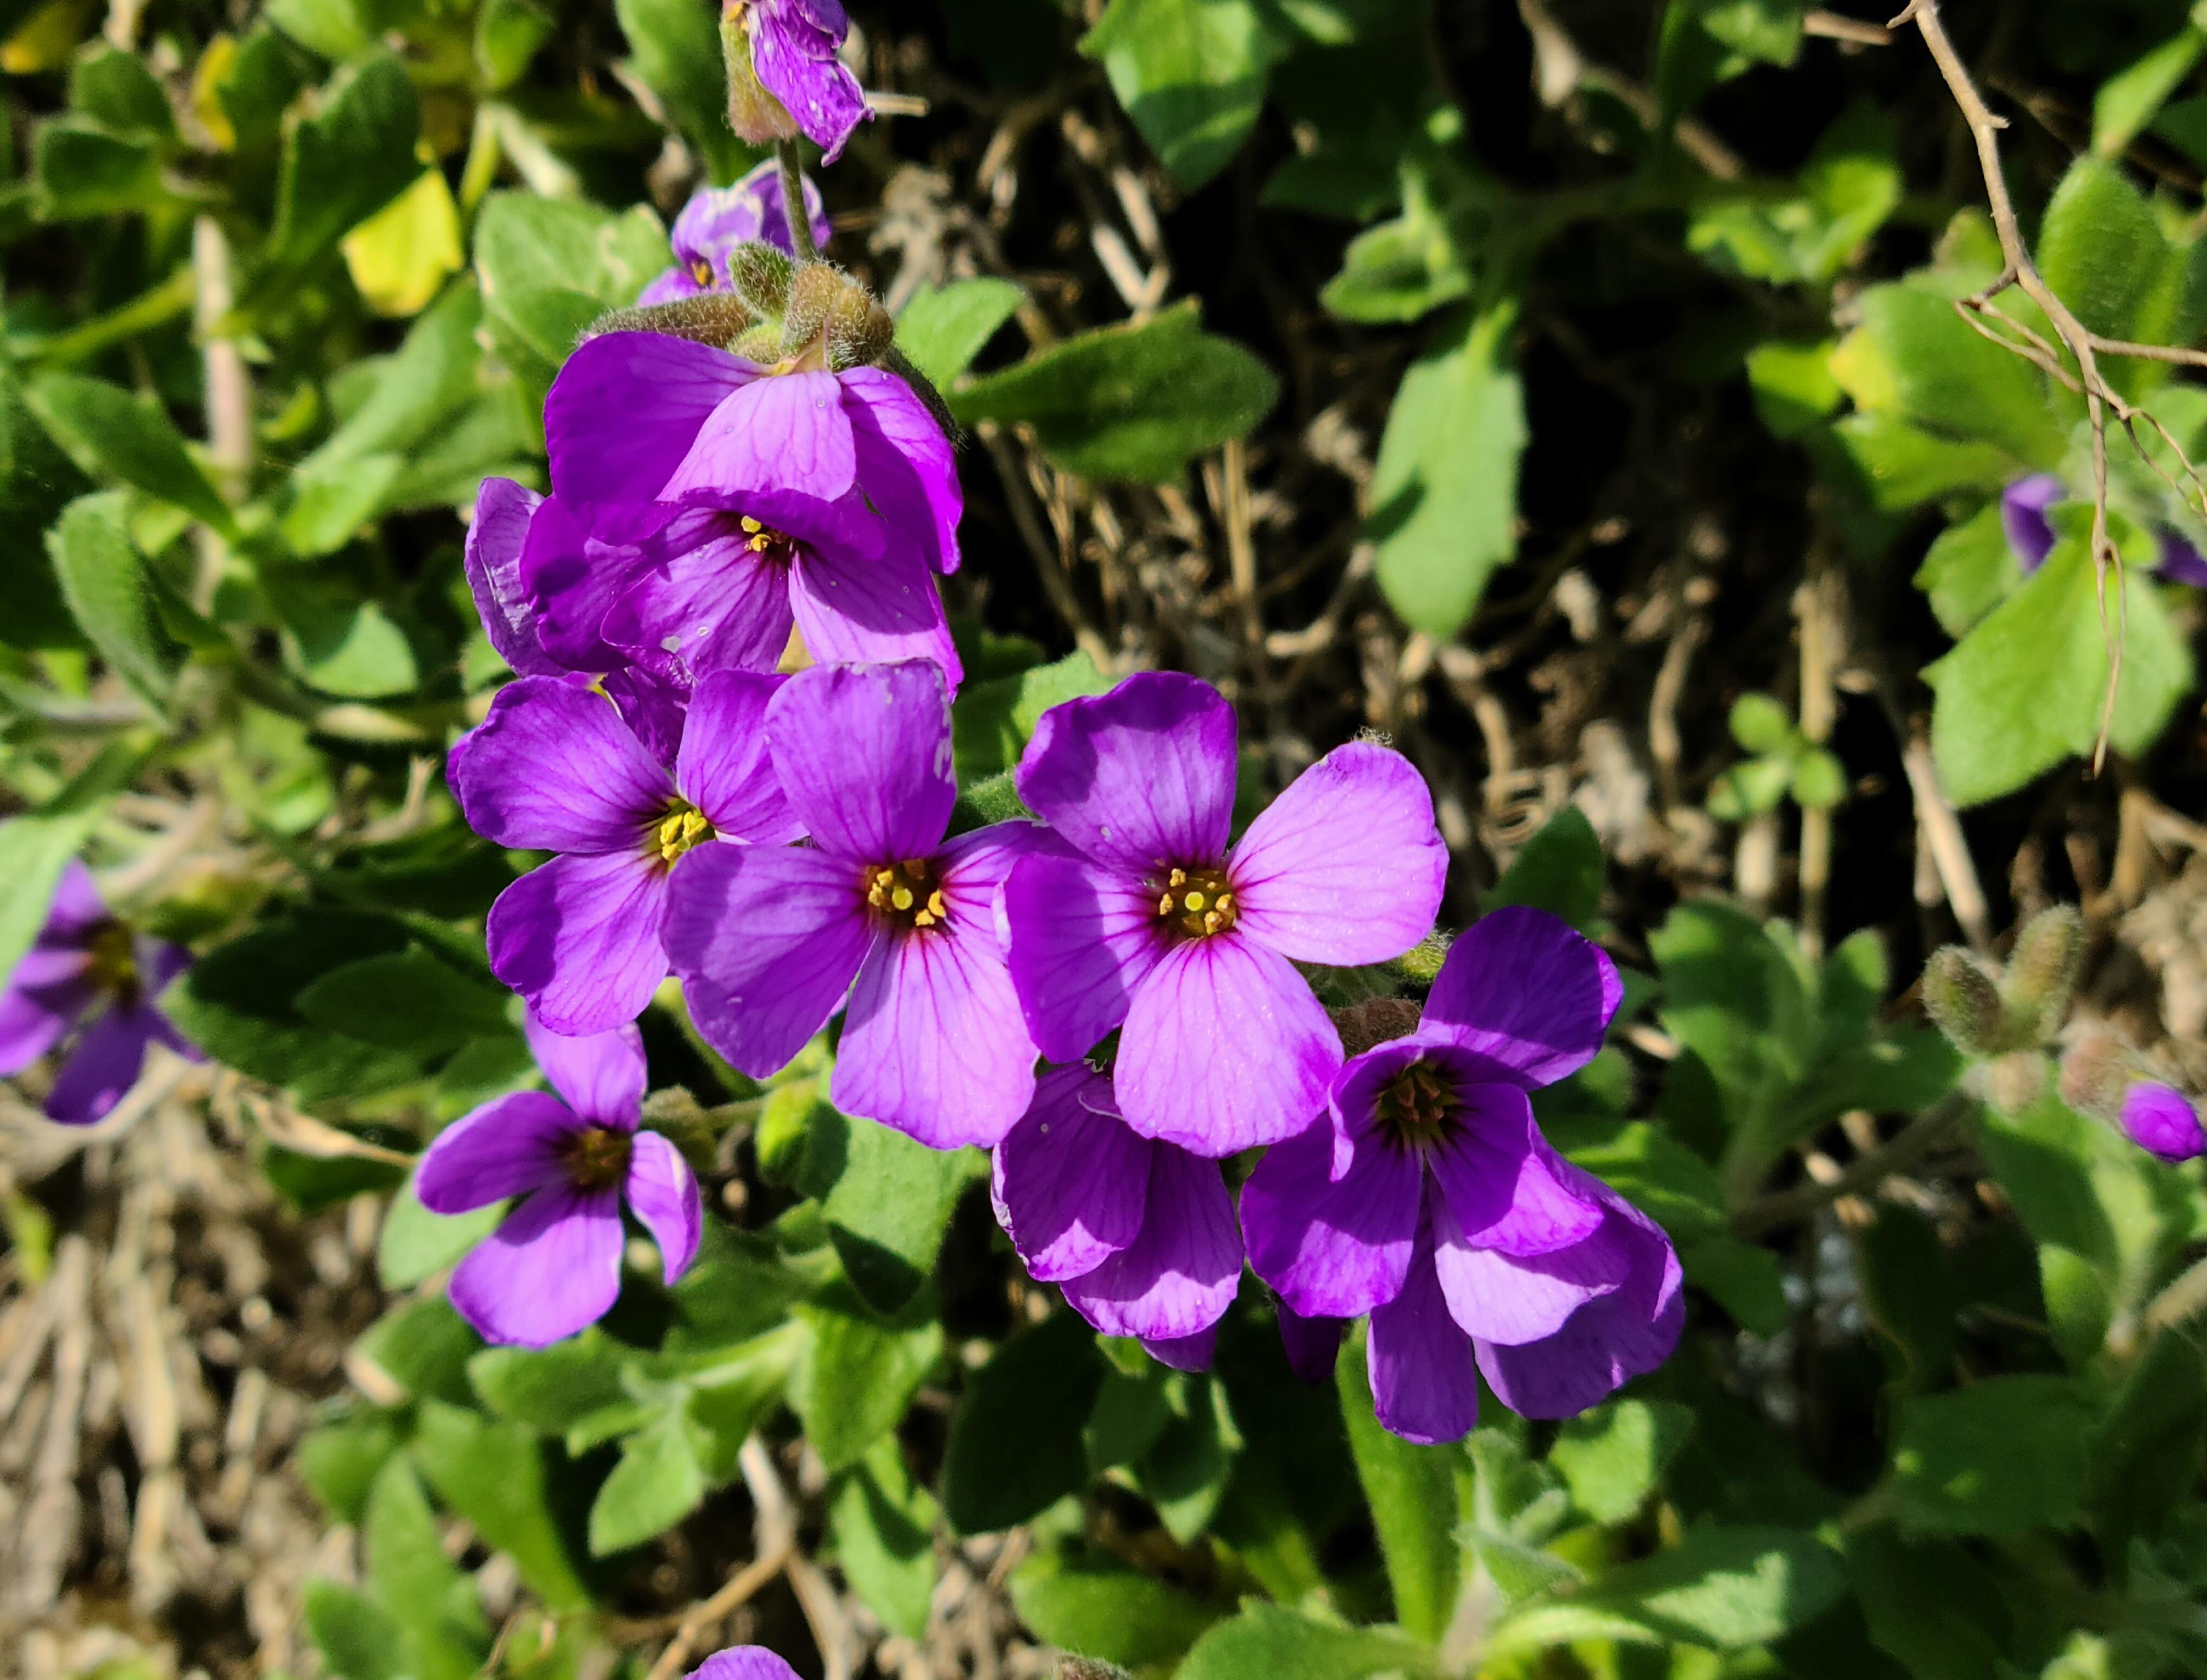 flowers-64mp-crop